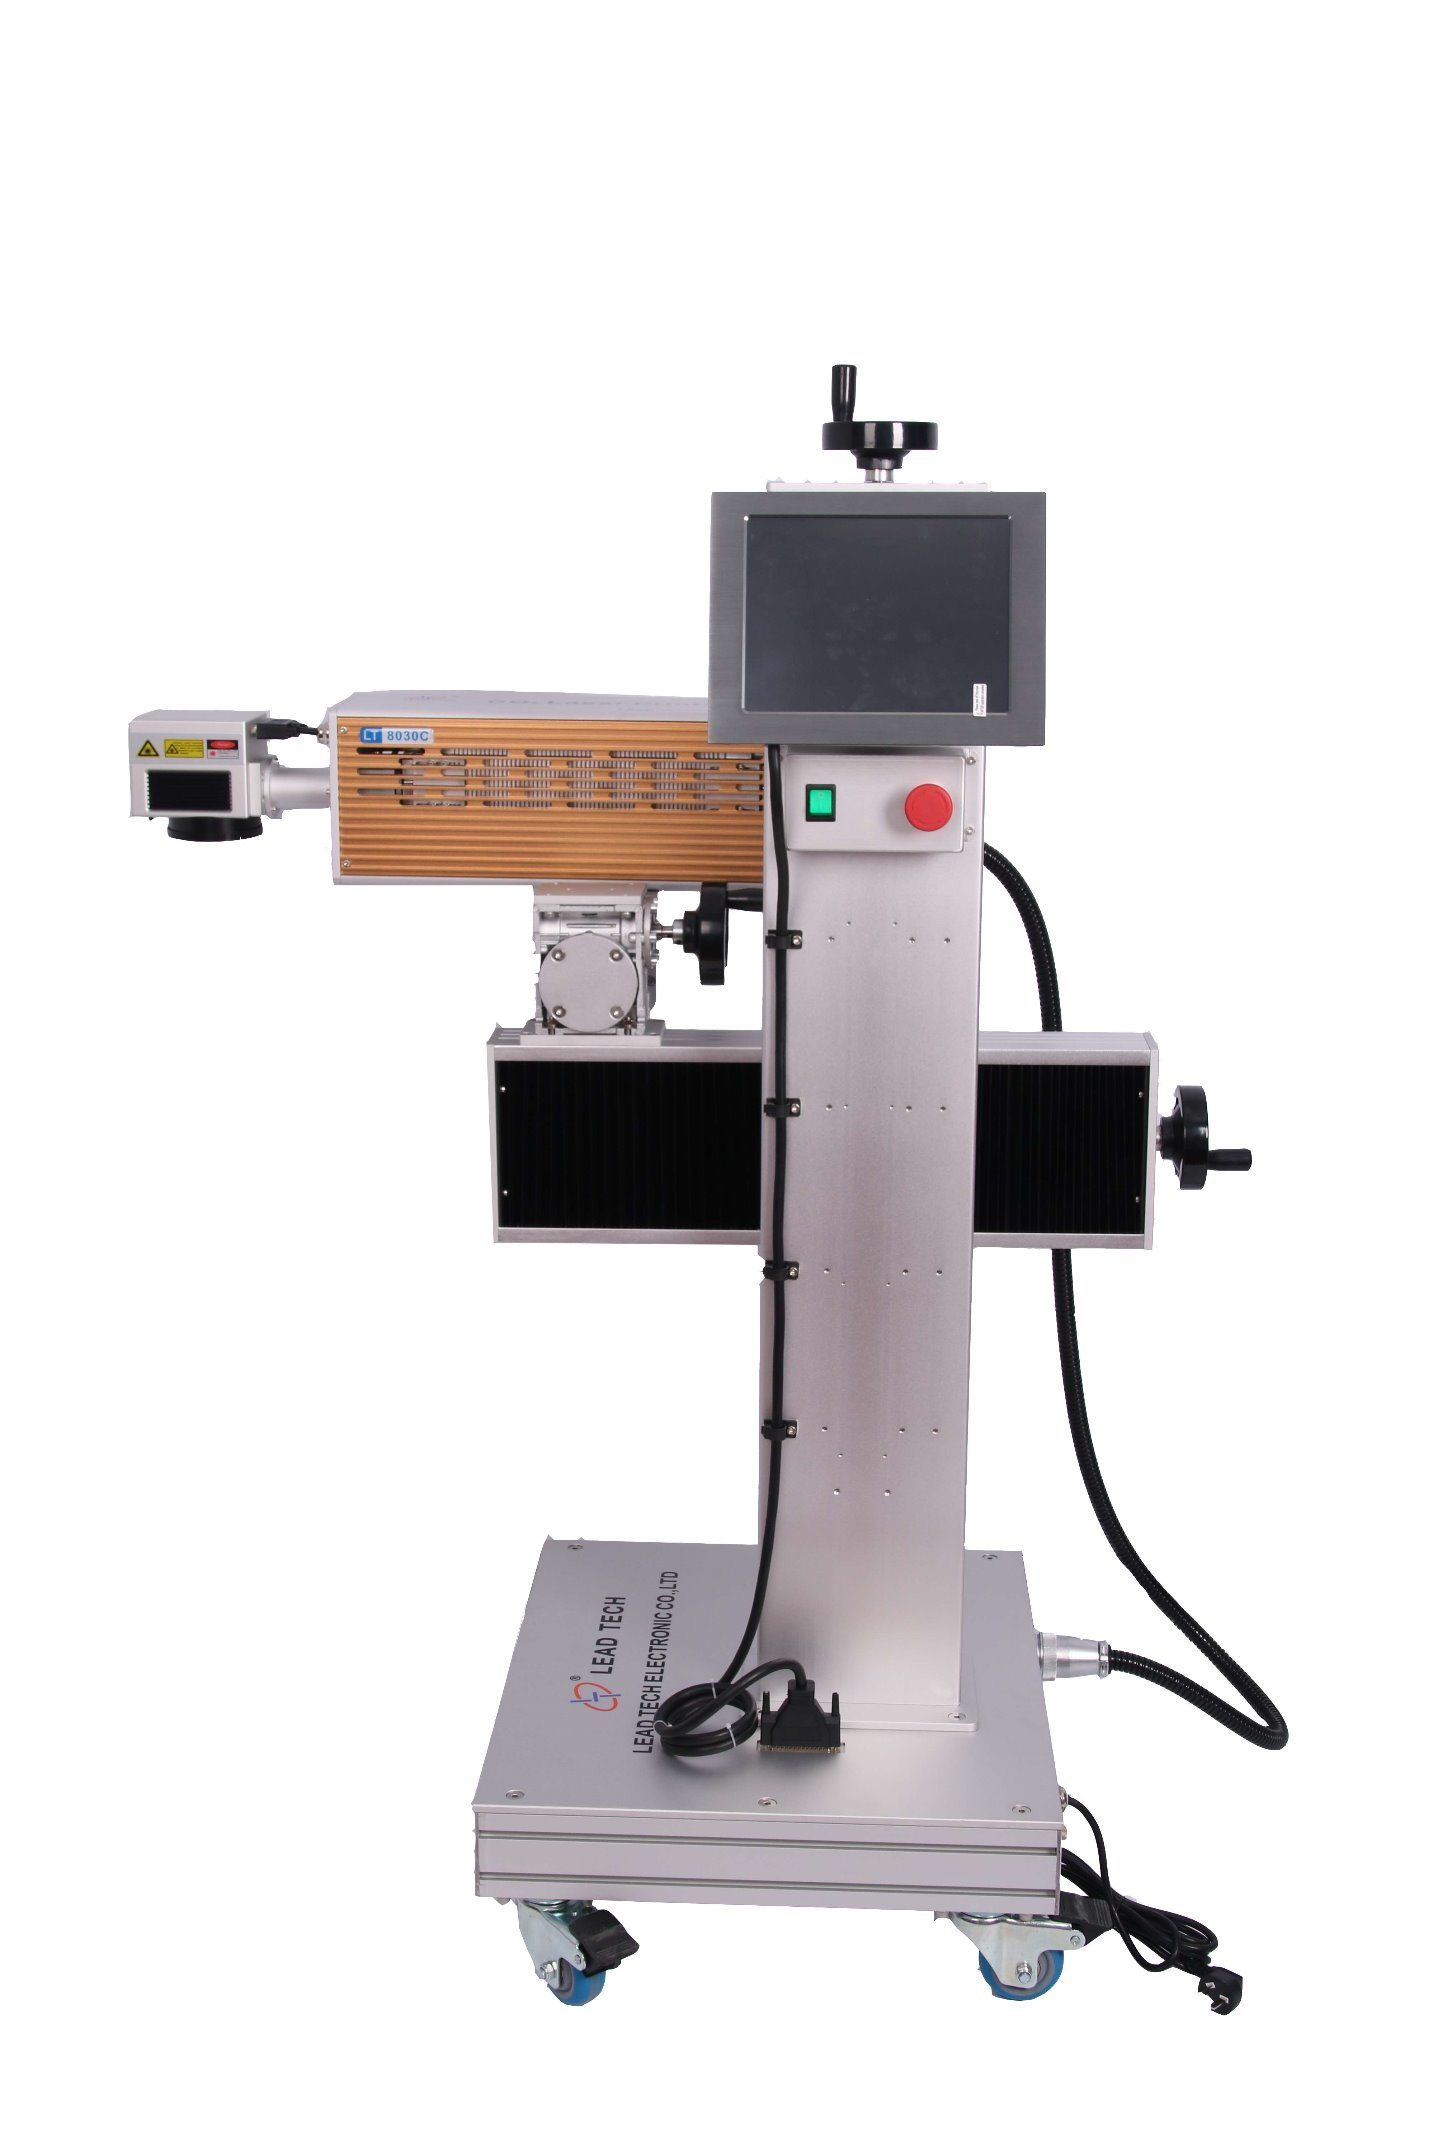 Lt8030c CO2 High Performance Economic Pet Bottle Laser Marking Printer